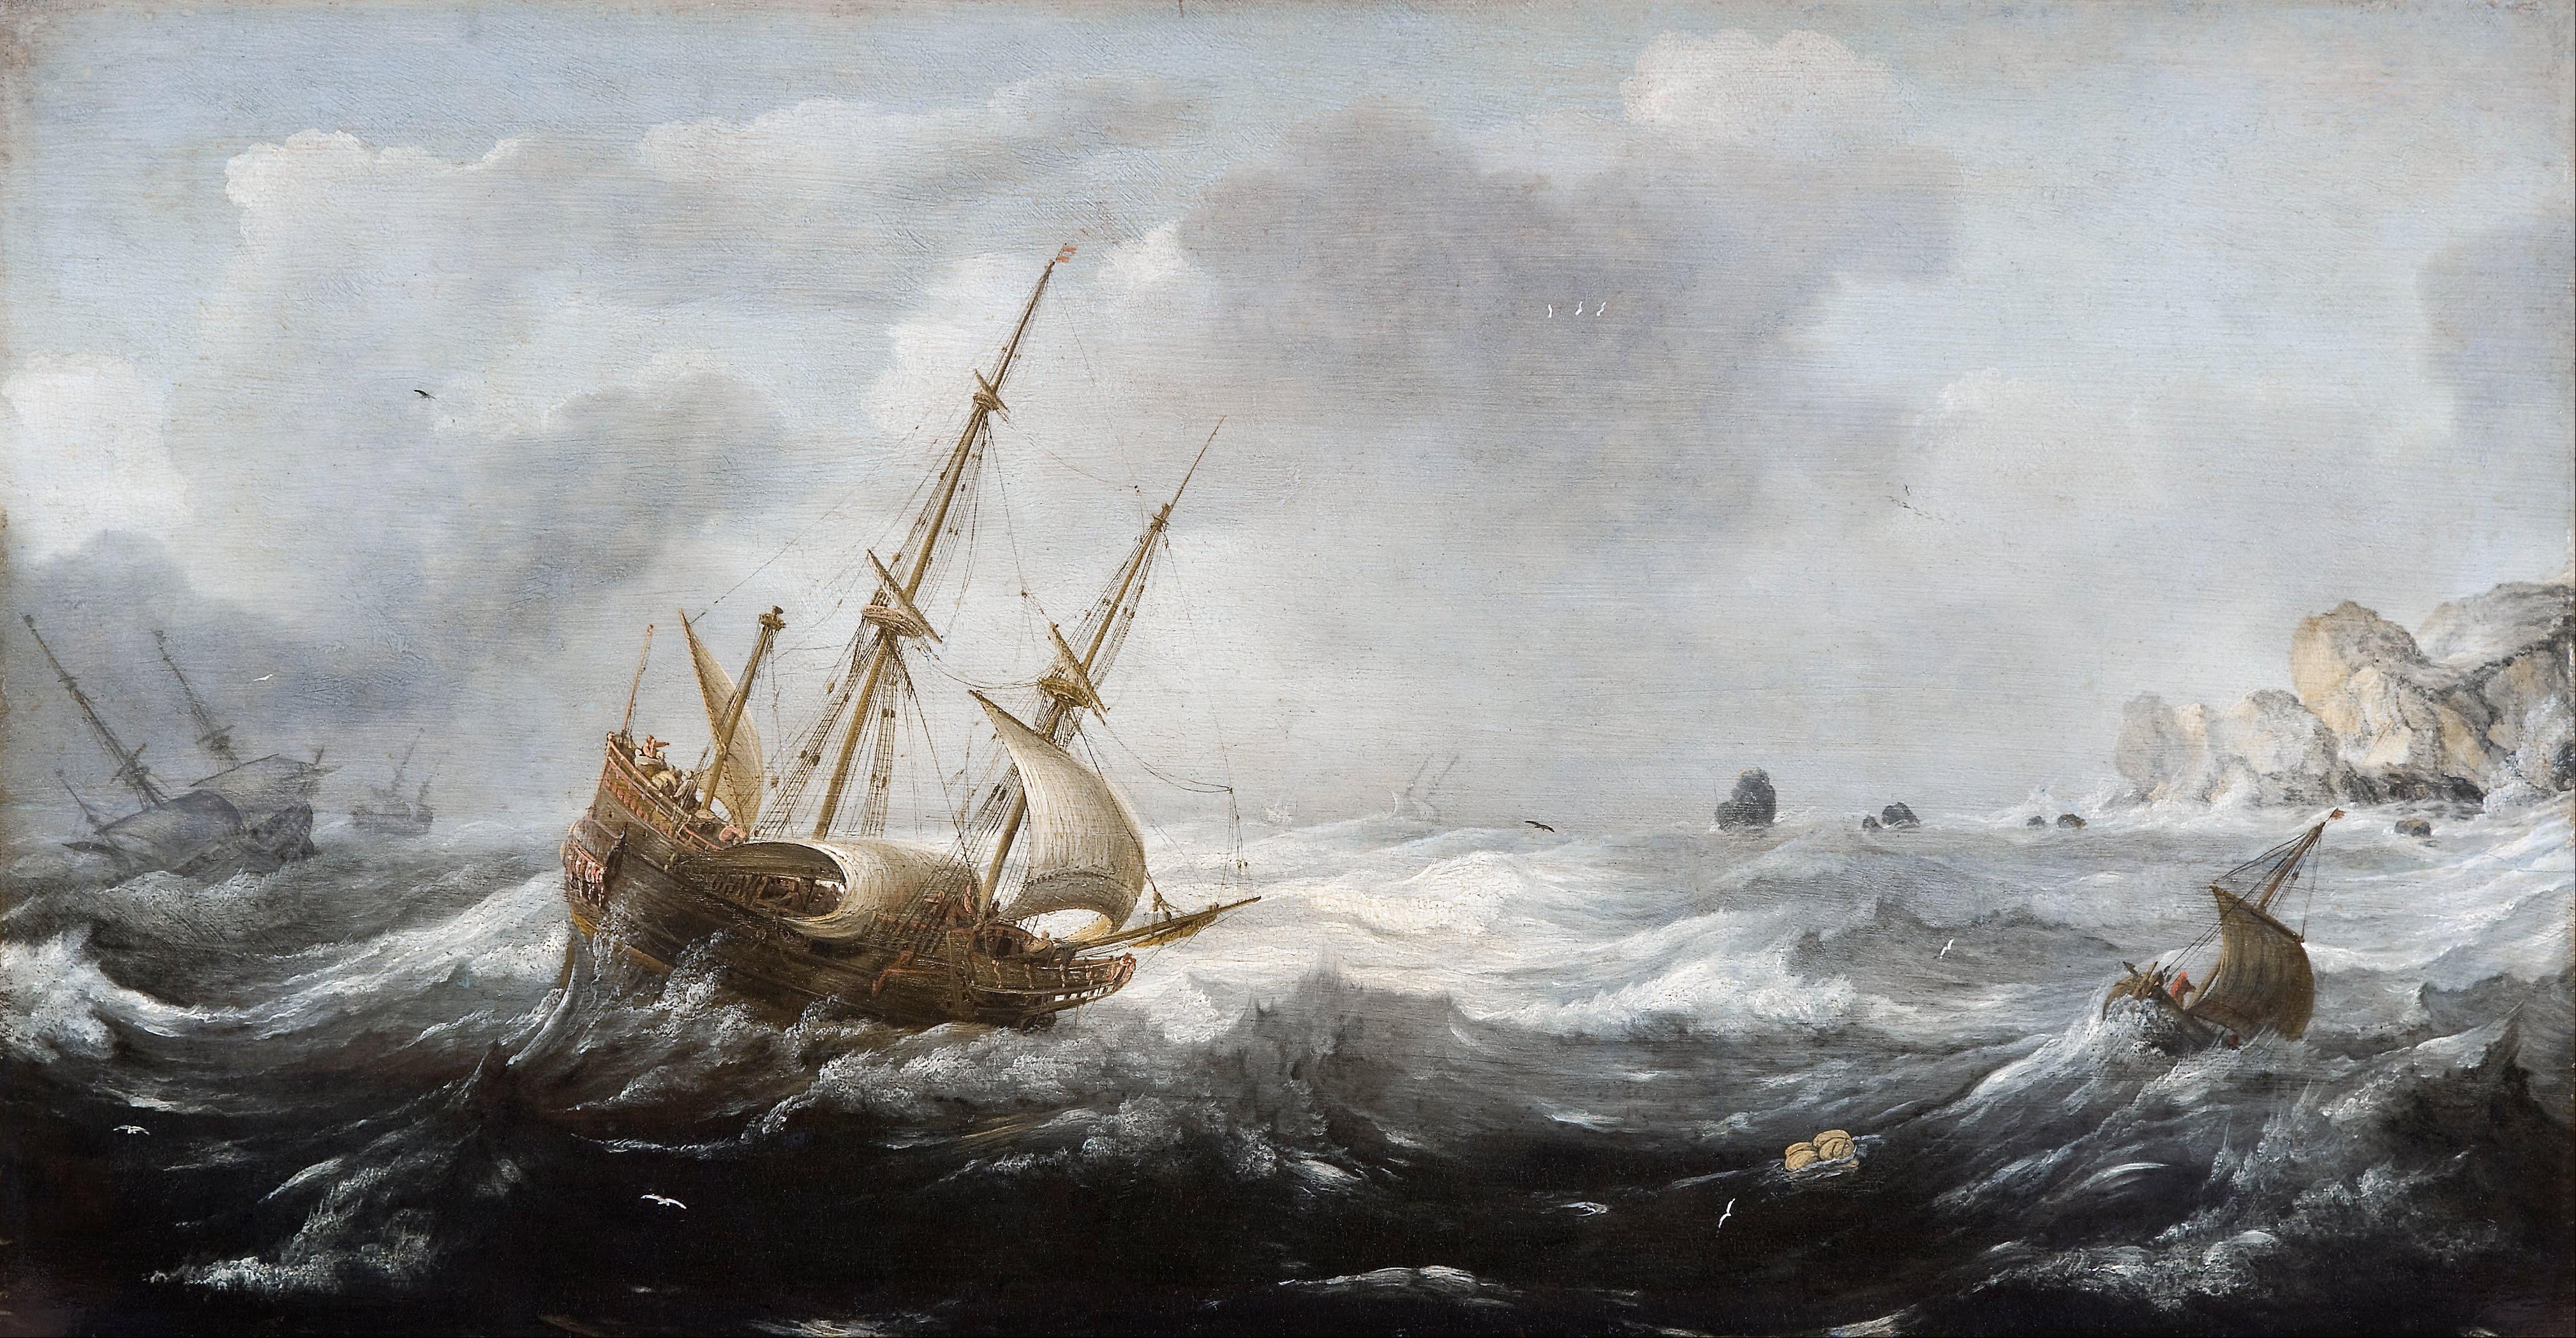 Worksheet Ship In A Storm filejan porcellis ships in a storm on rocky coast google art